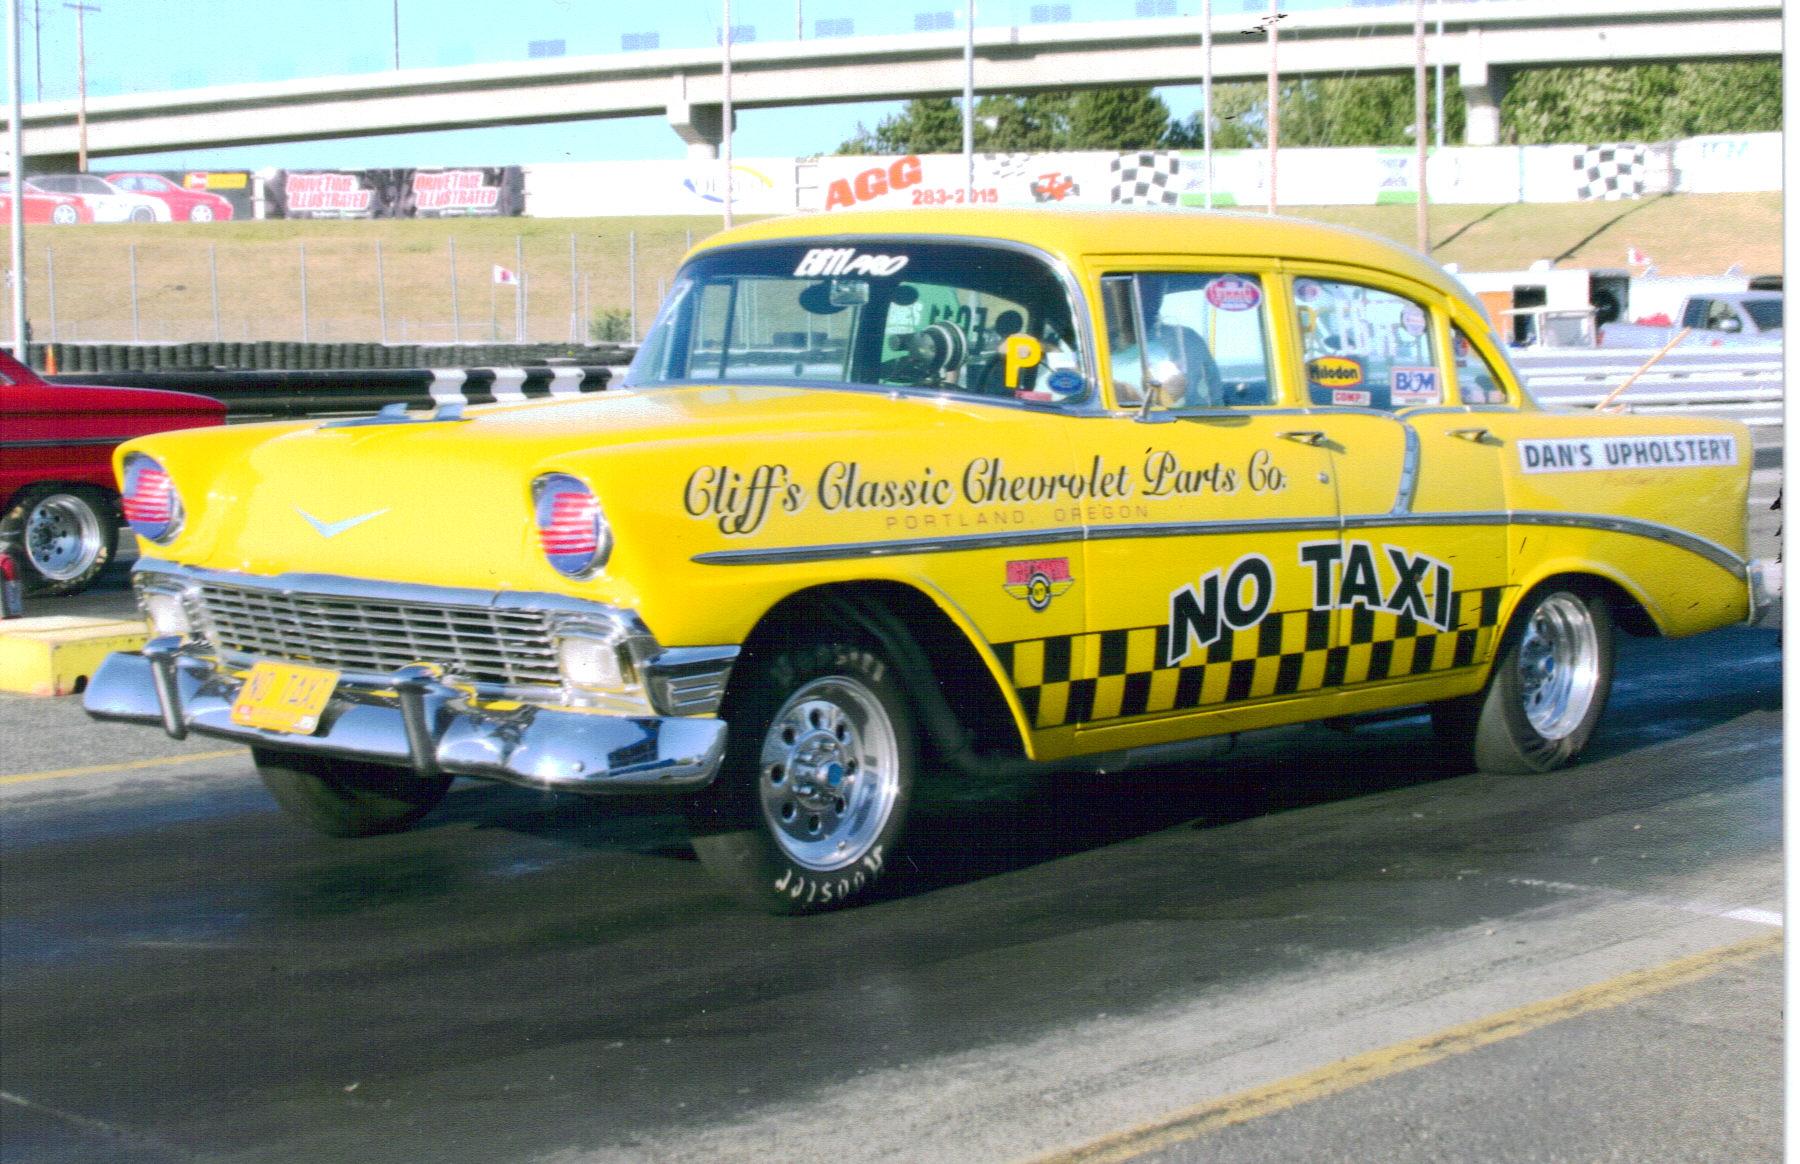 Cliff's Classic Chevrolet